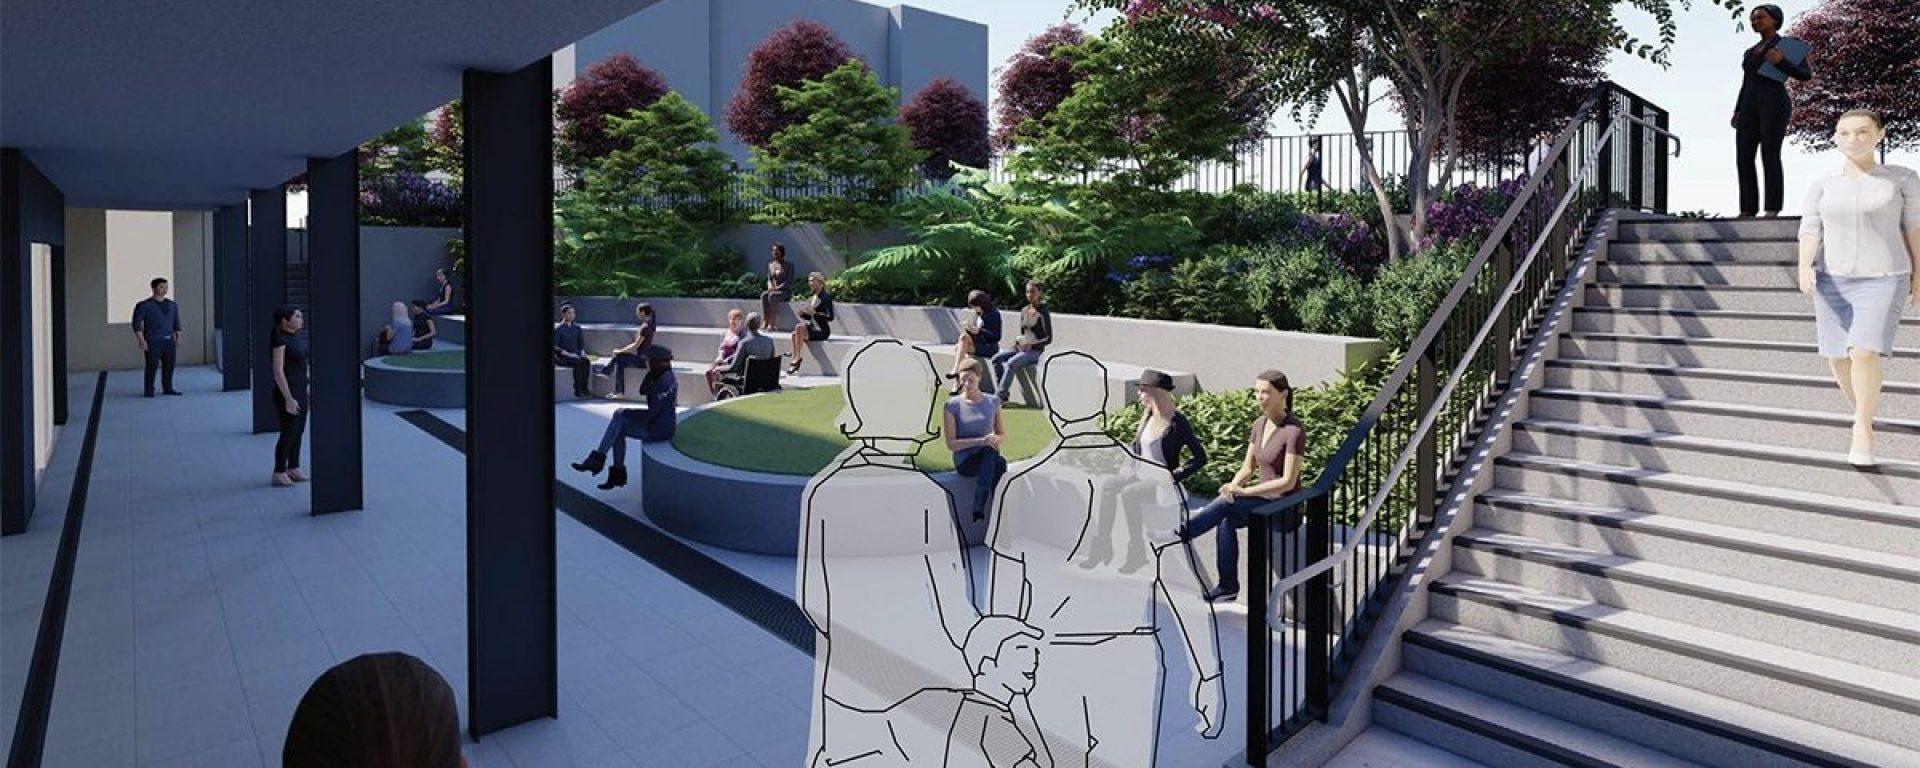 125 Community Garden featured image